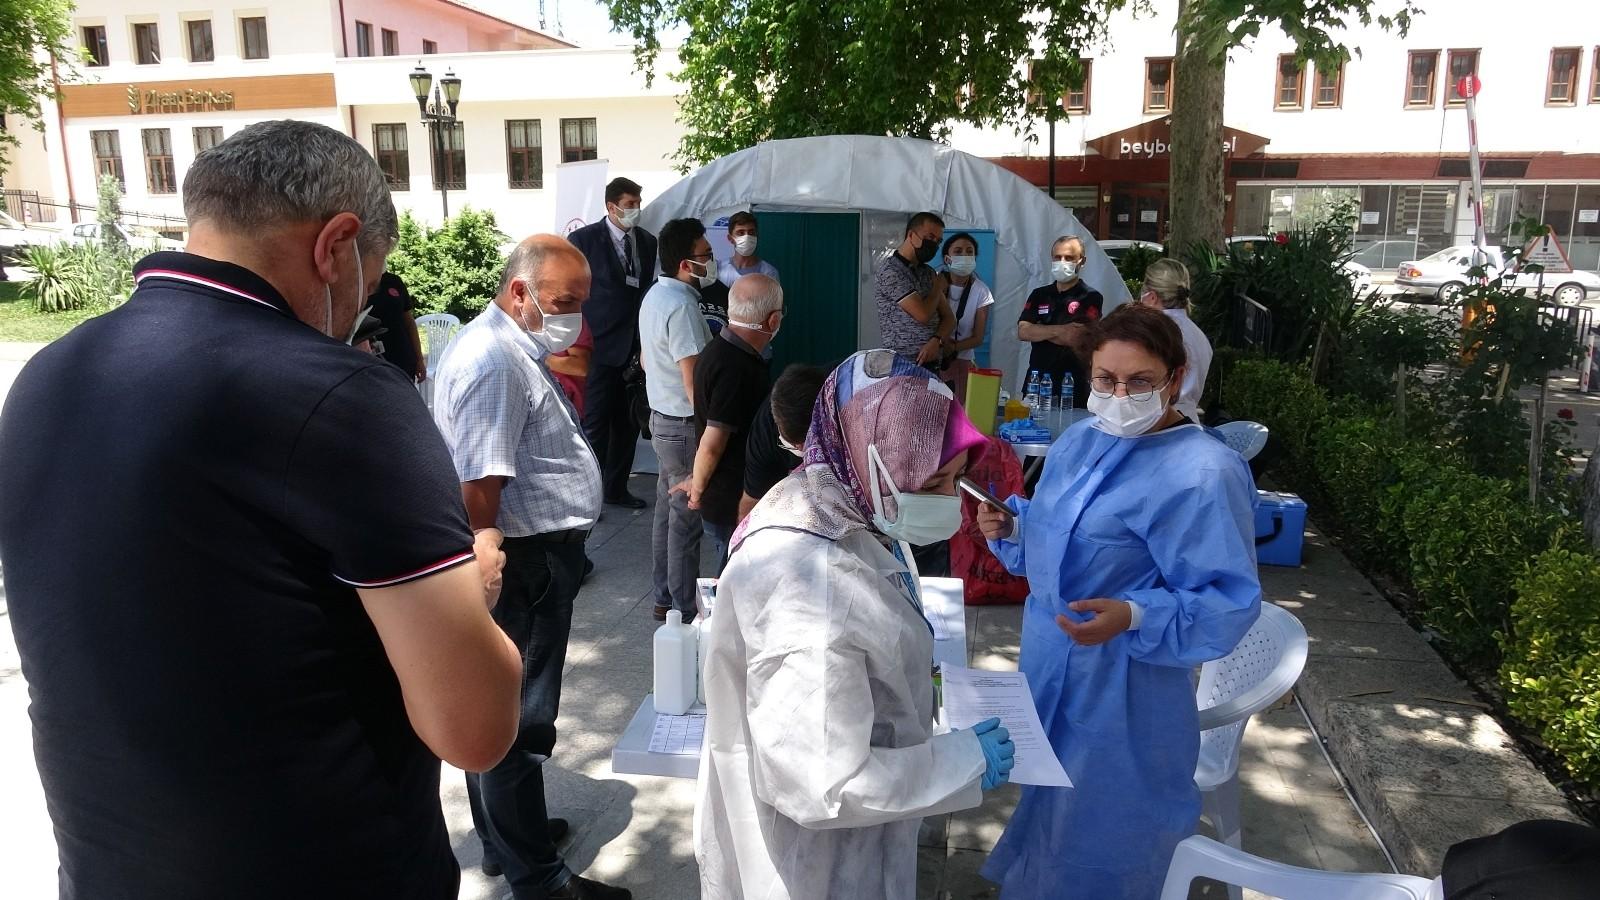 Randevusuz aşı çadırına yoğun ilgi